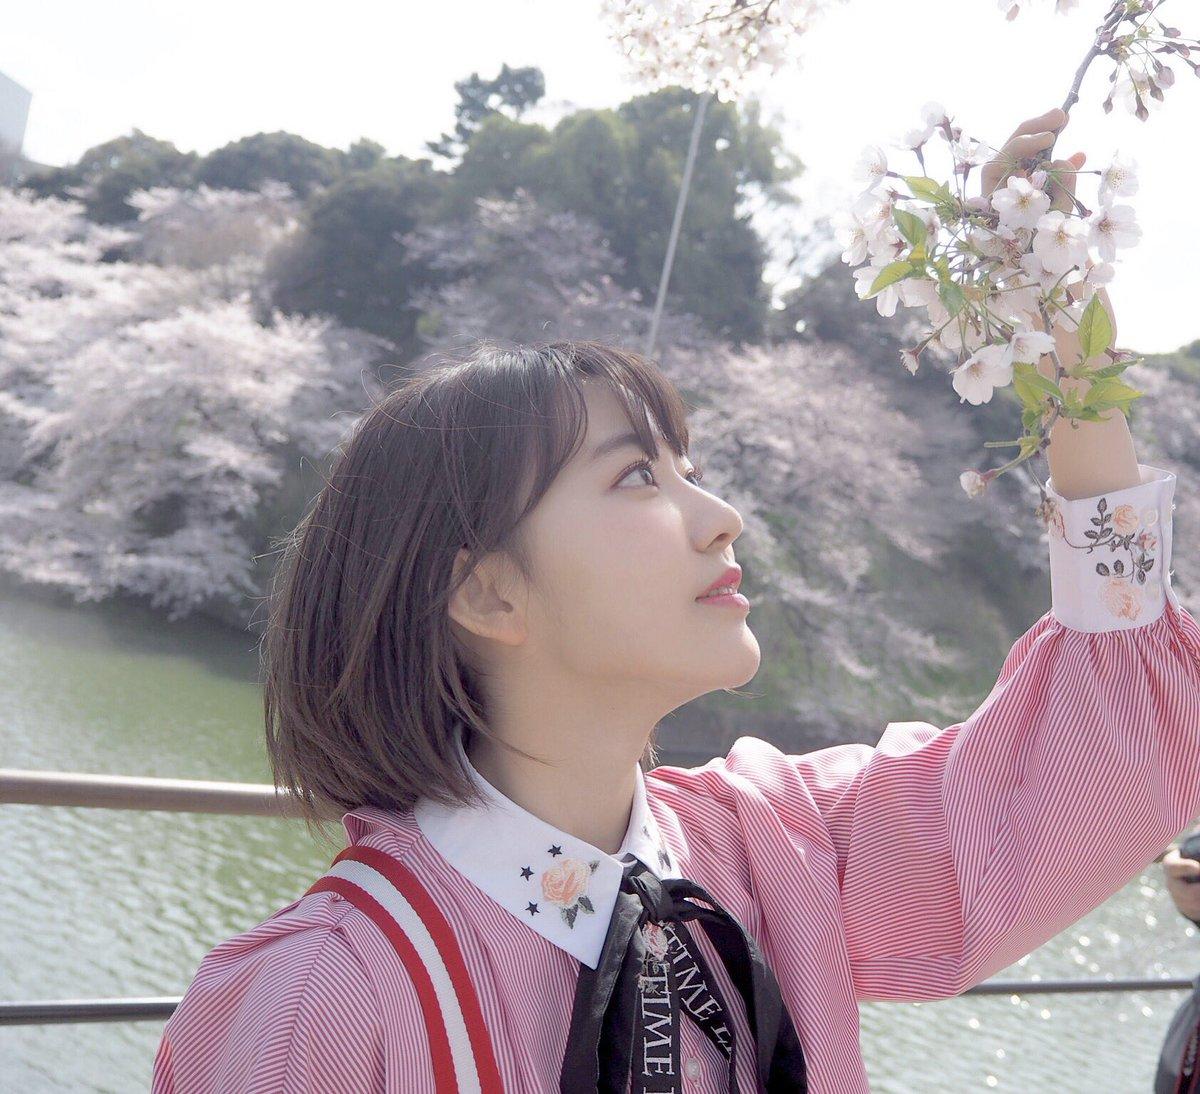 HKT48の宮脇咲良ちゃん『蜷川実花さんに薦められて千鳥ヶ淵と国立劇場前で』 2018 桜 1